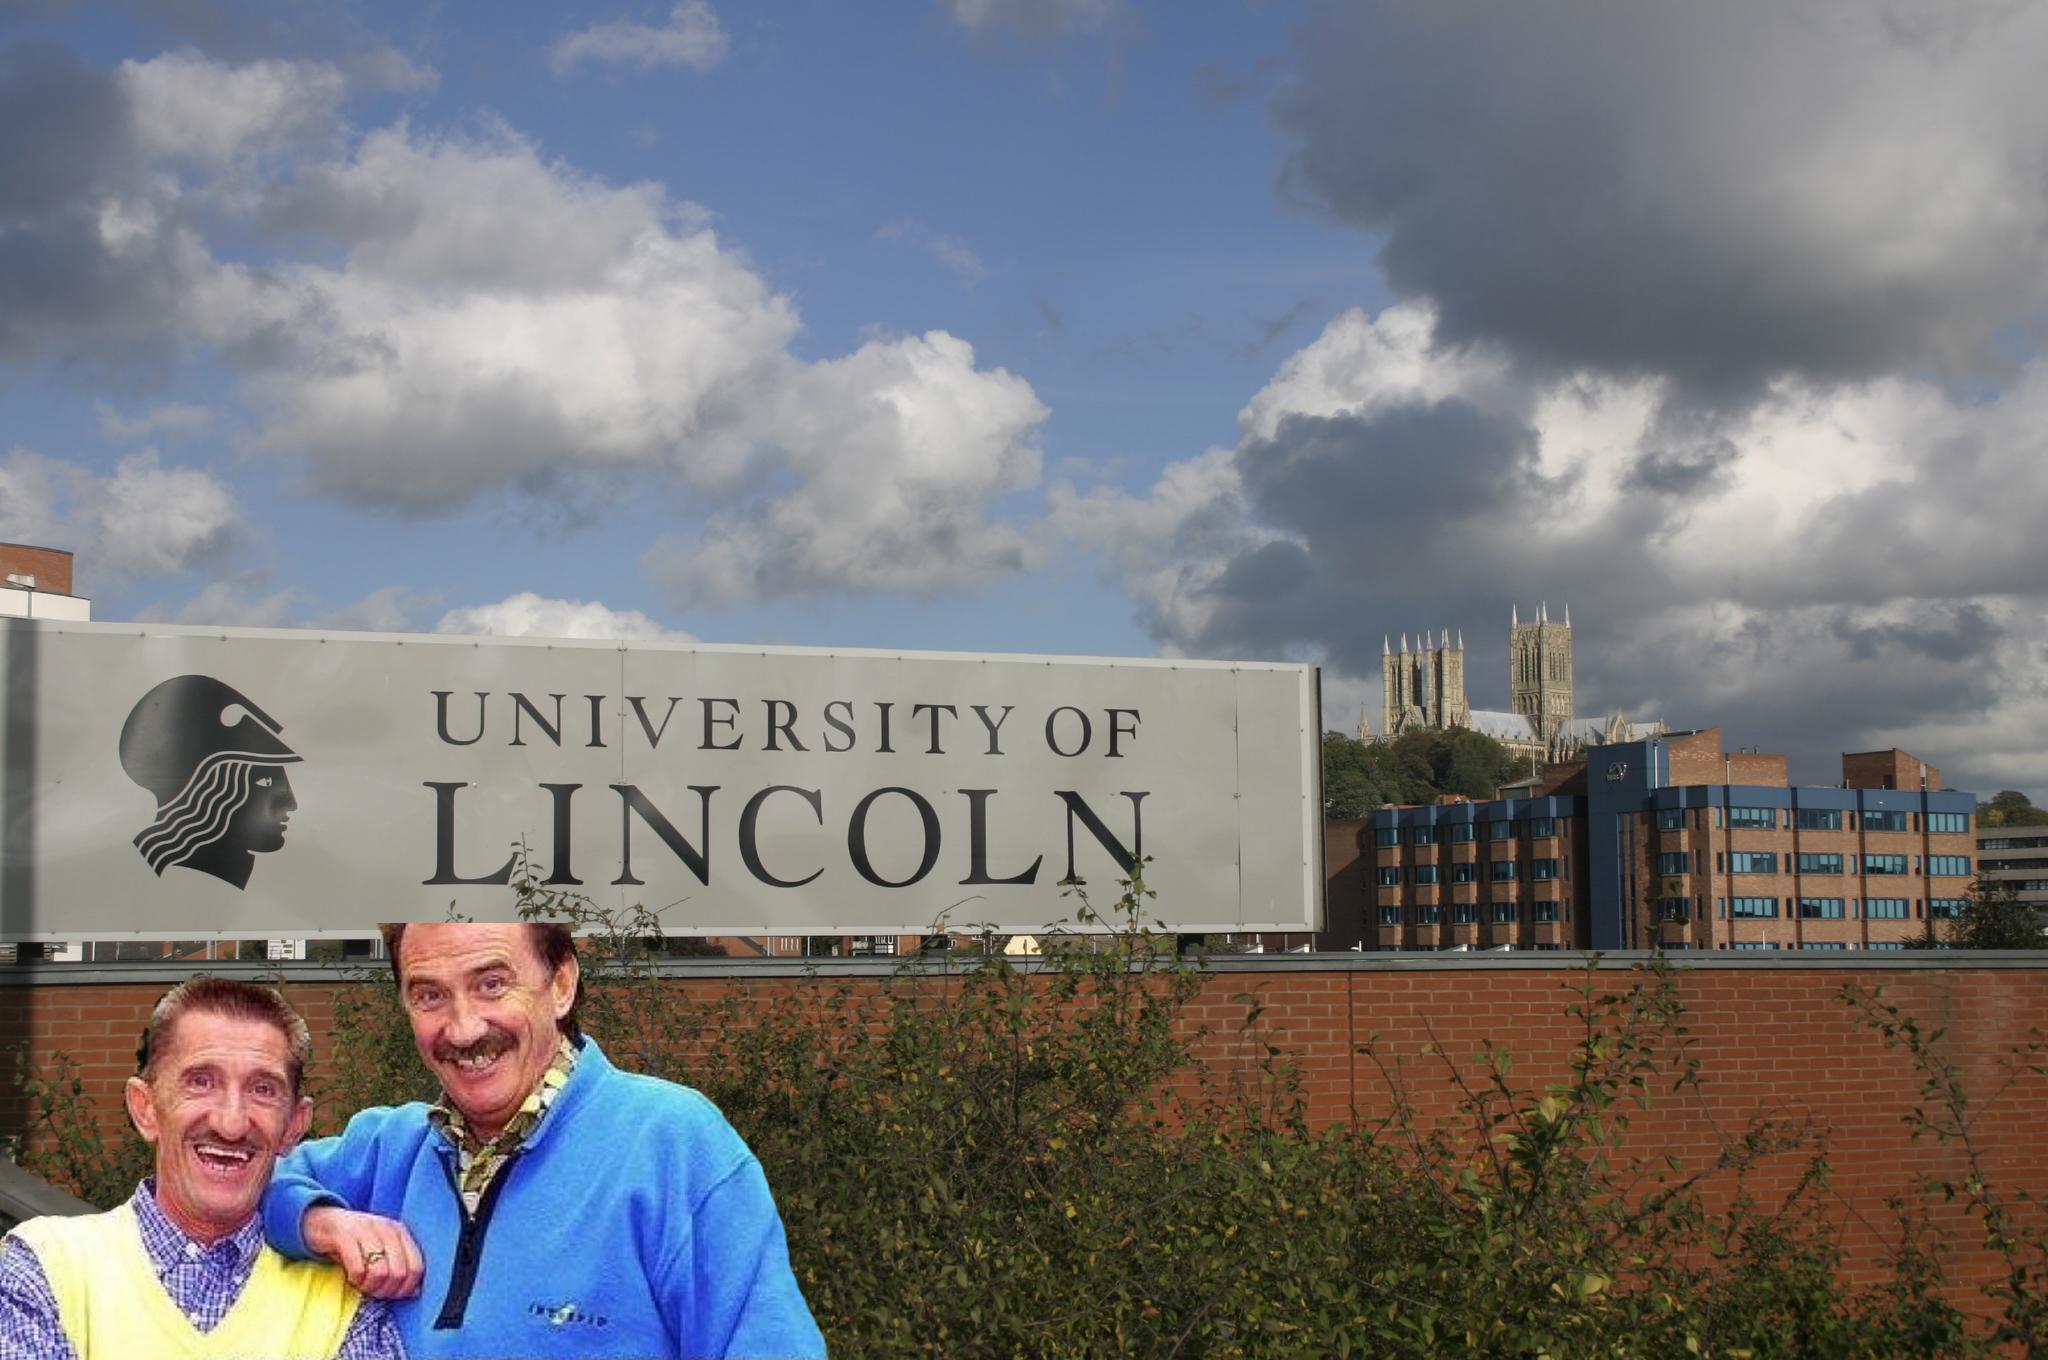 UK_University_of_Lincoln_logosign